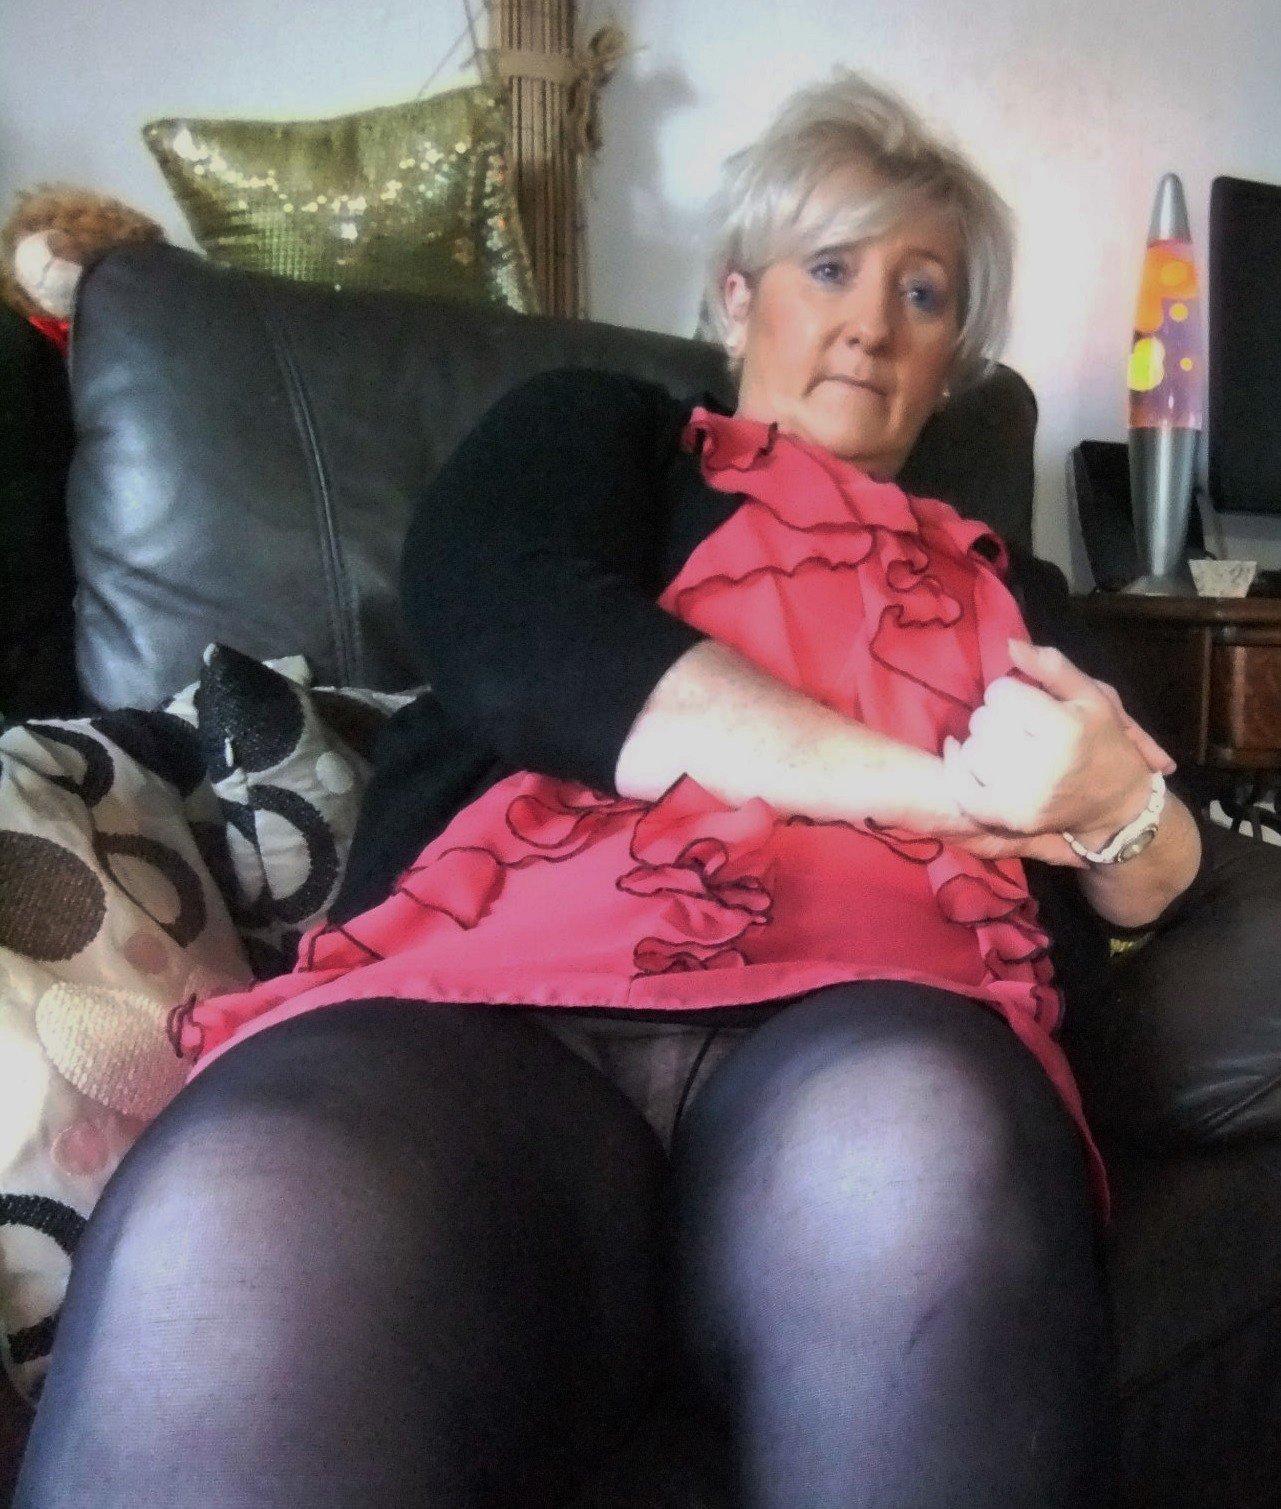 Tease tube Mature women upskirt